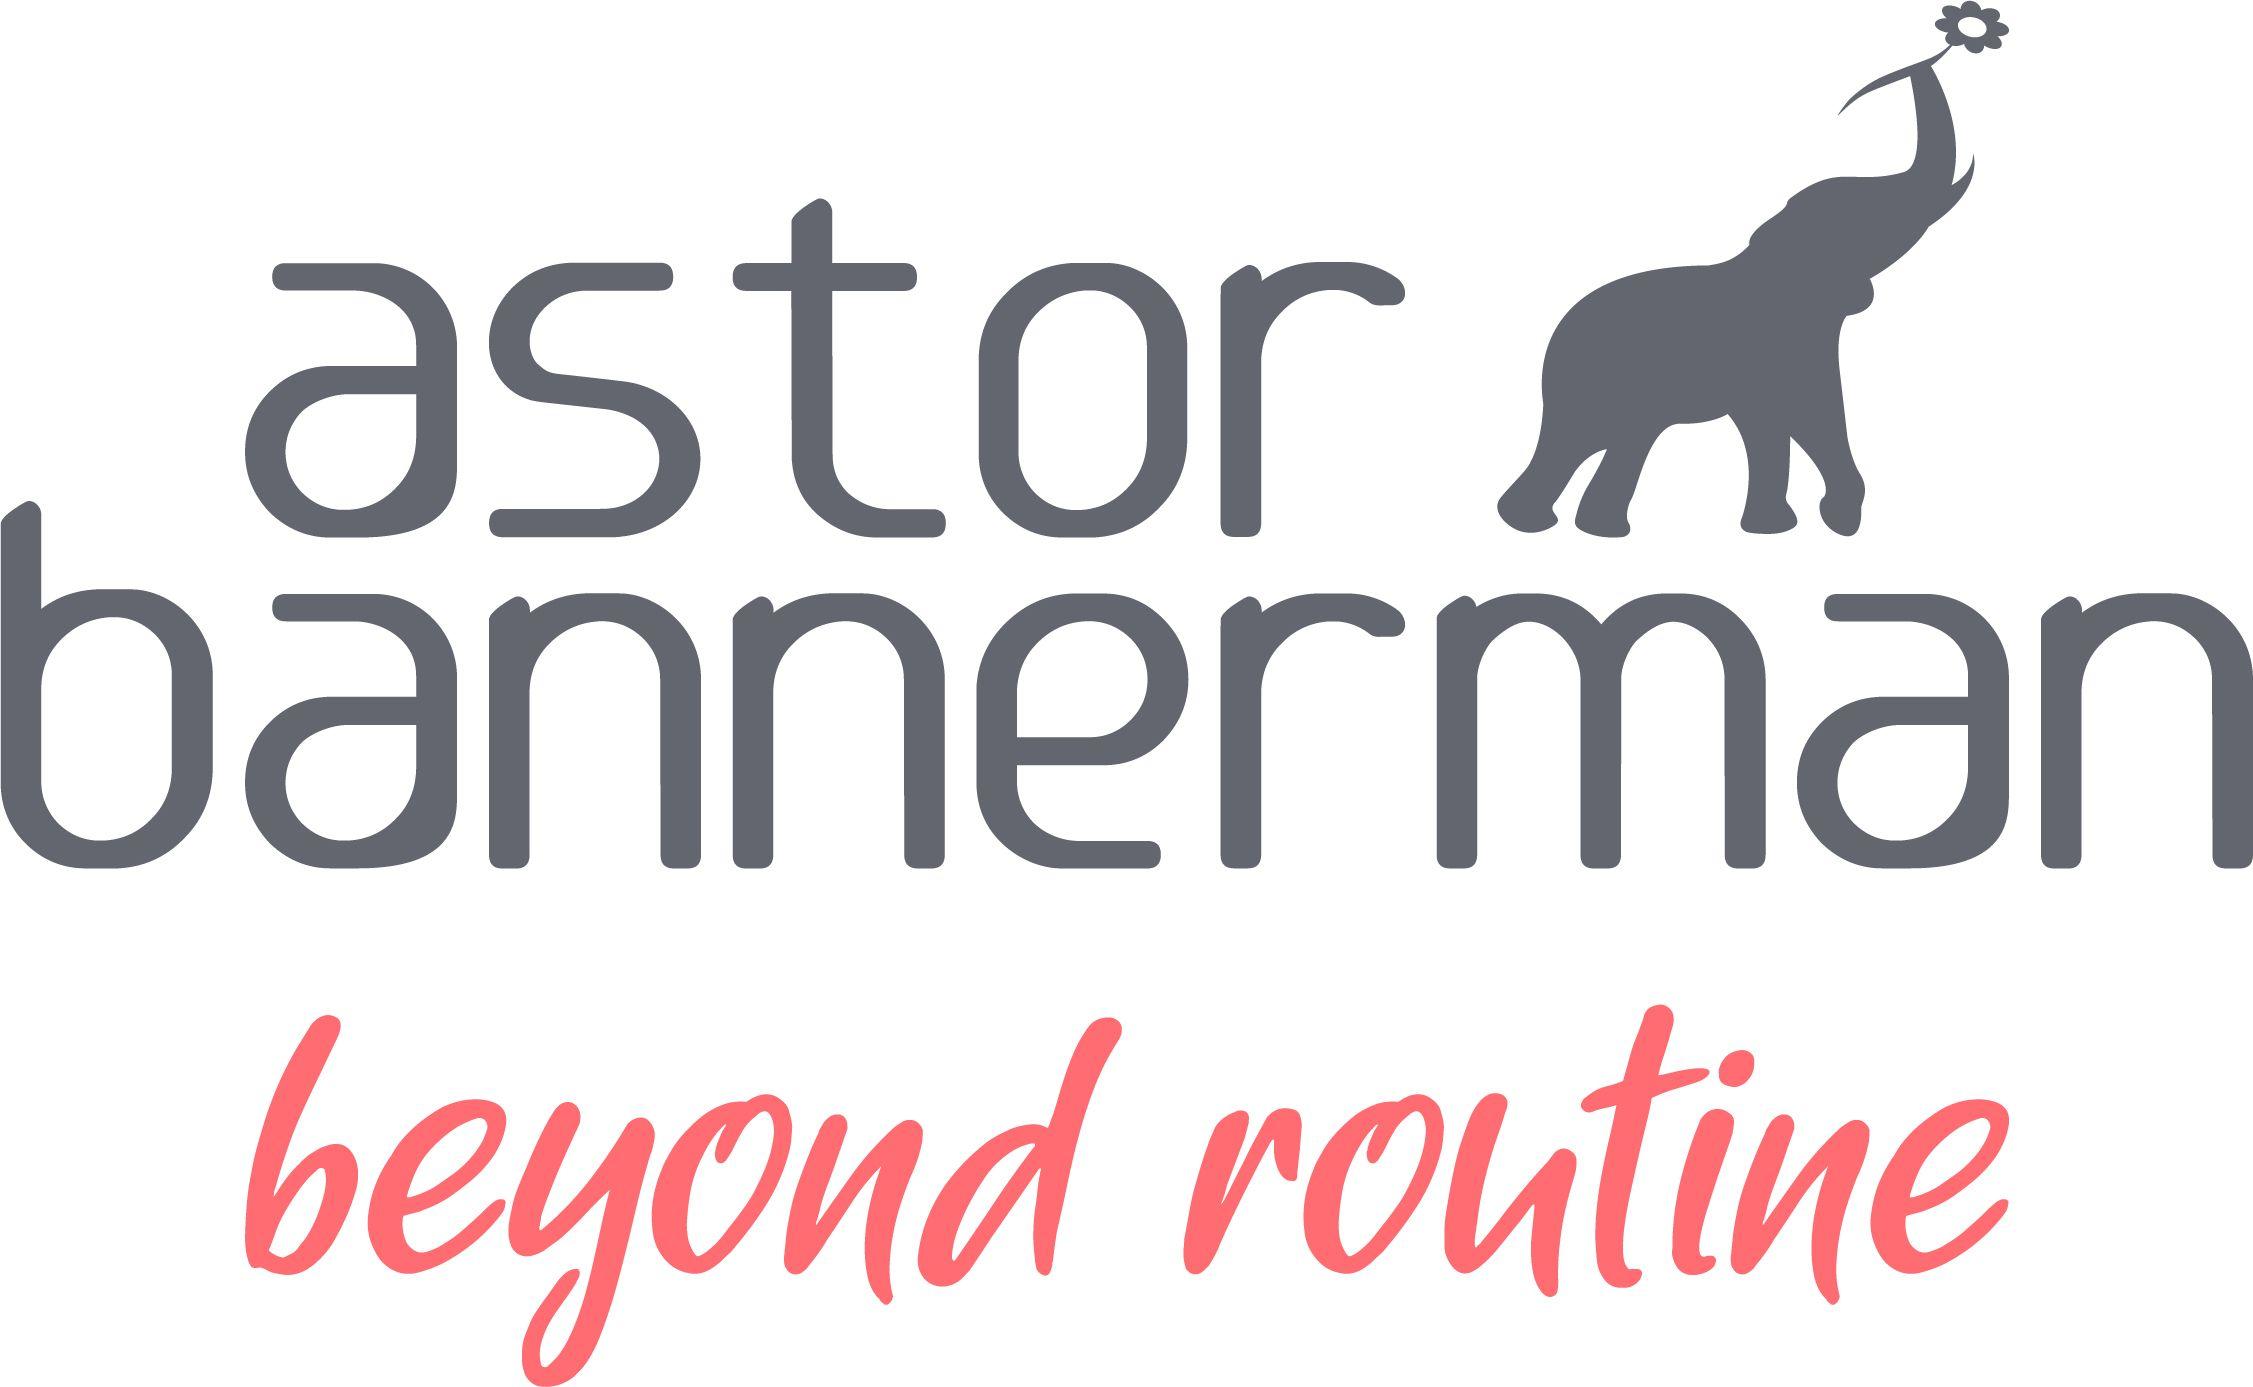 Astor-Bannerman